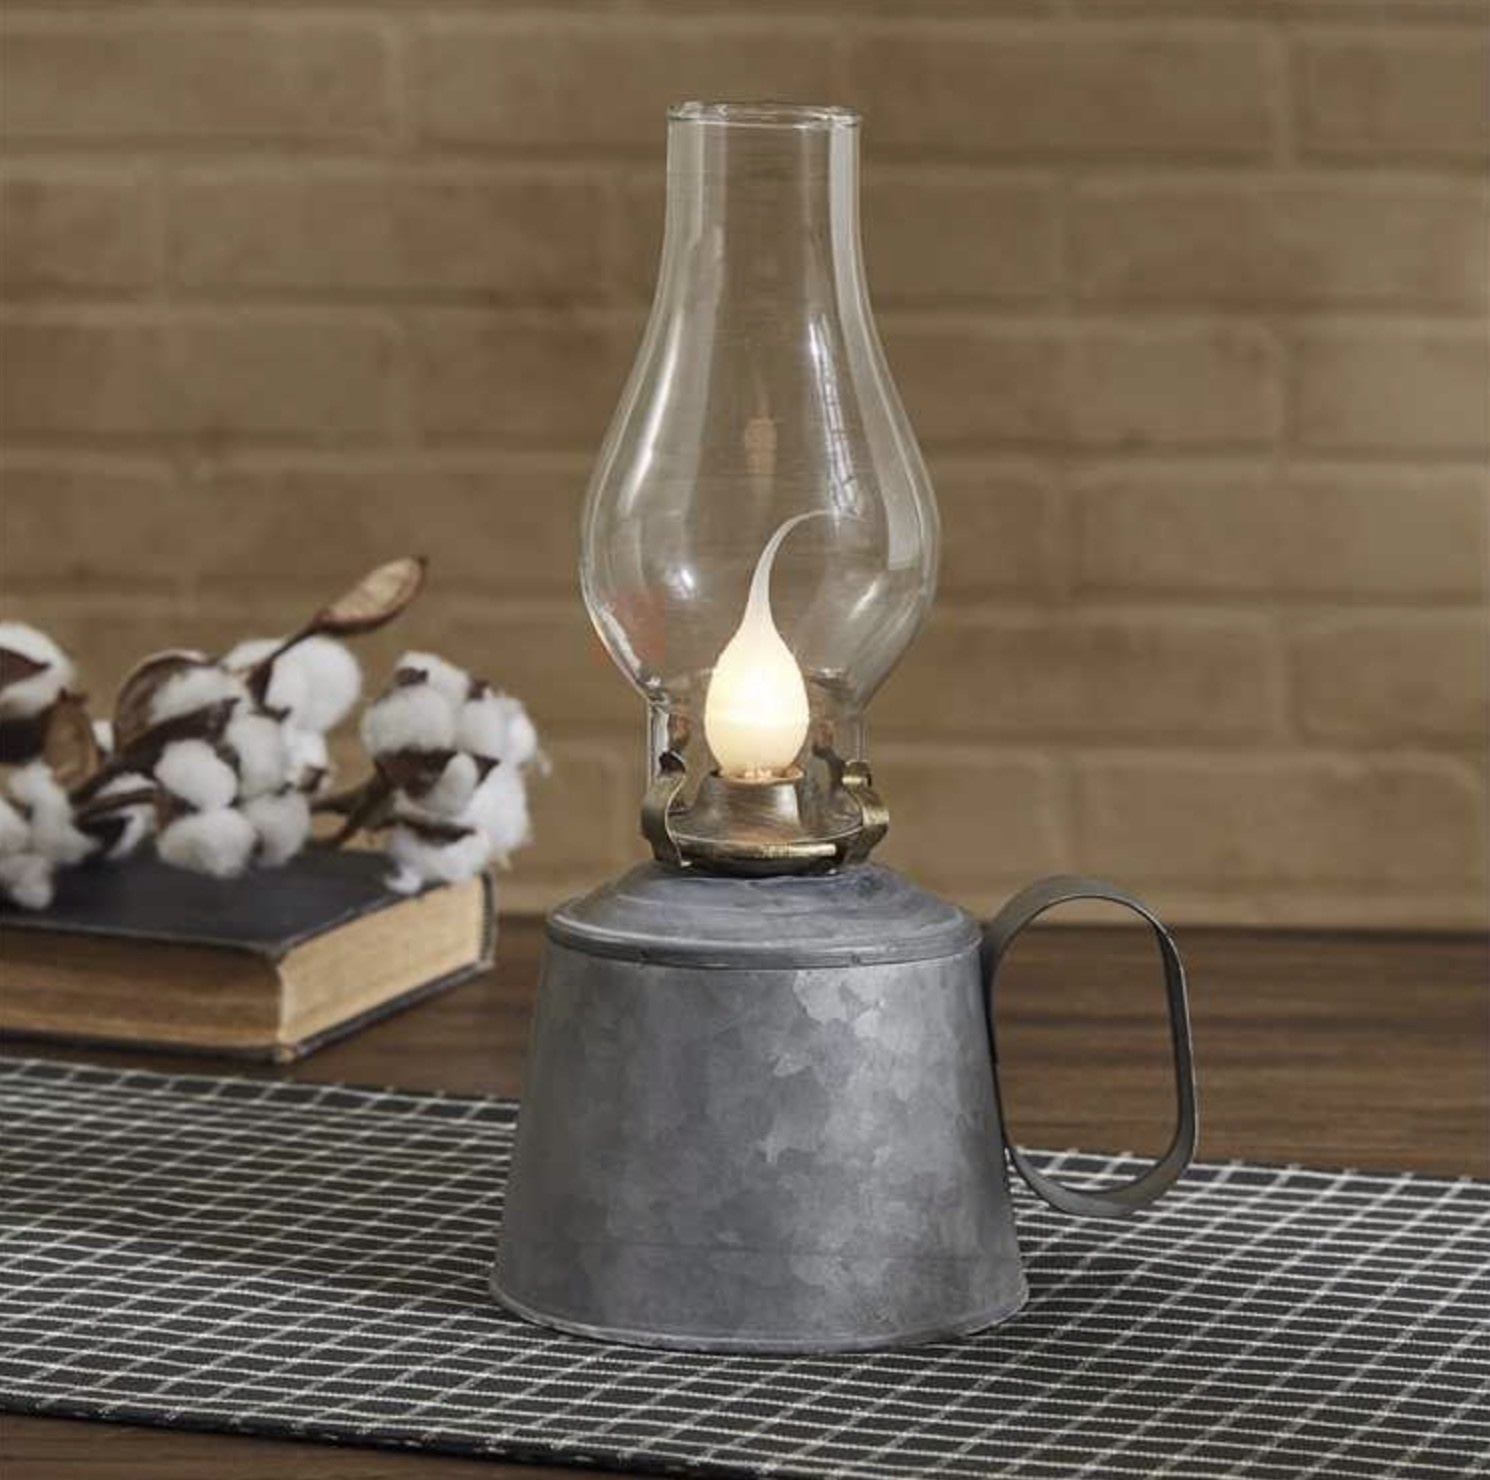 Park Designs Small Galvanized Oil Lamp with Globe